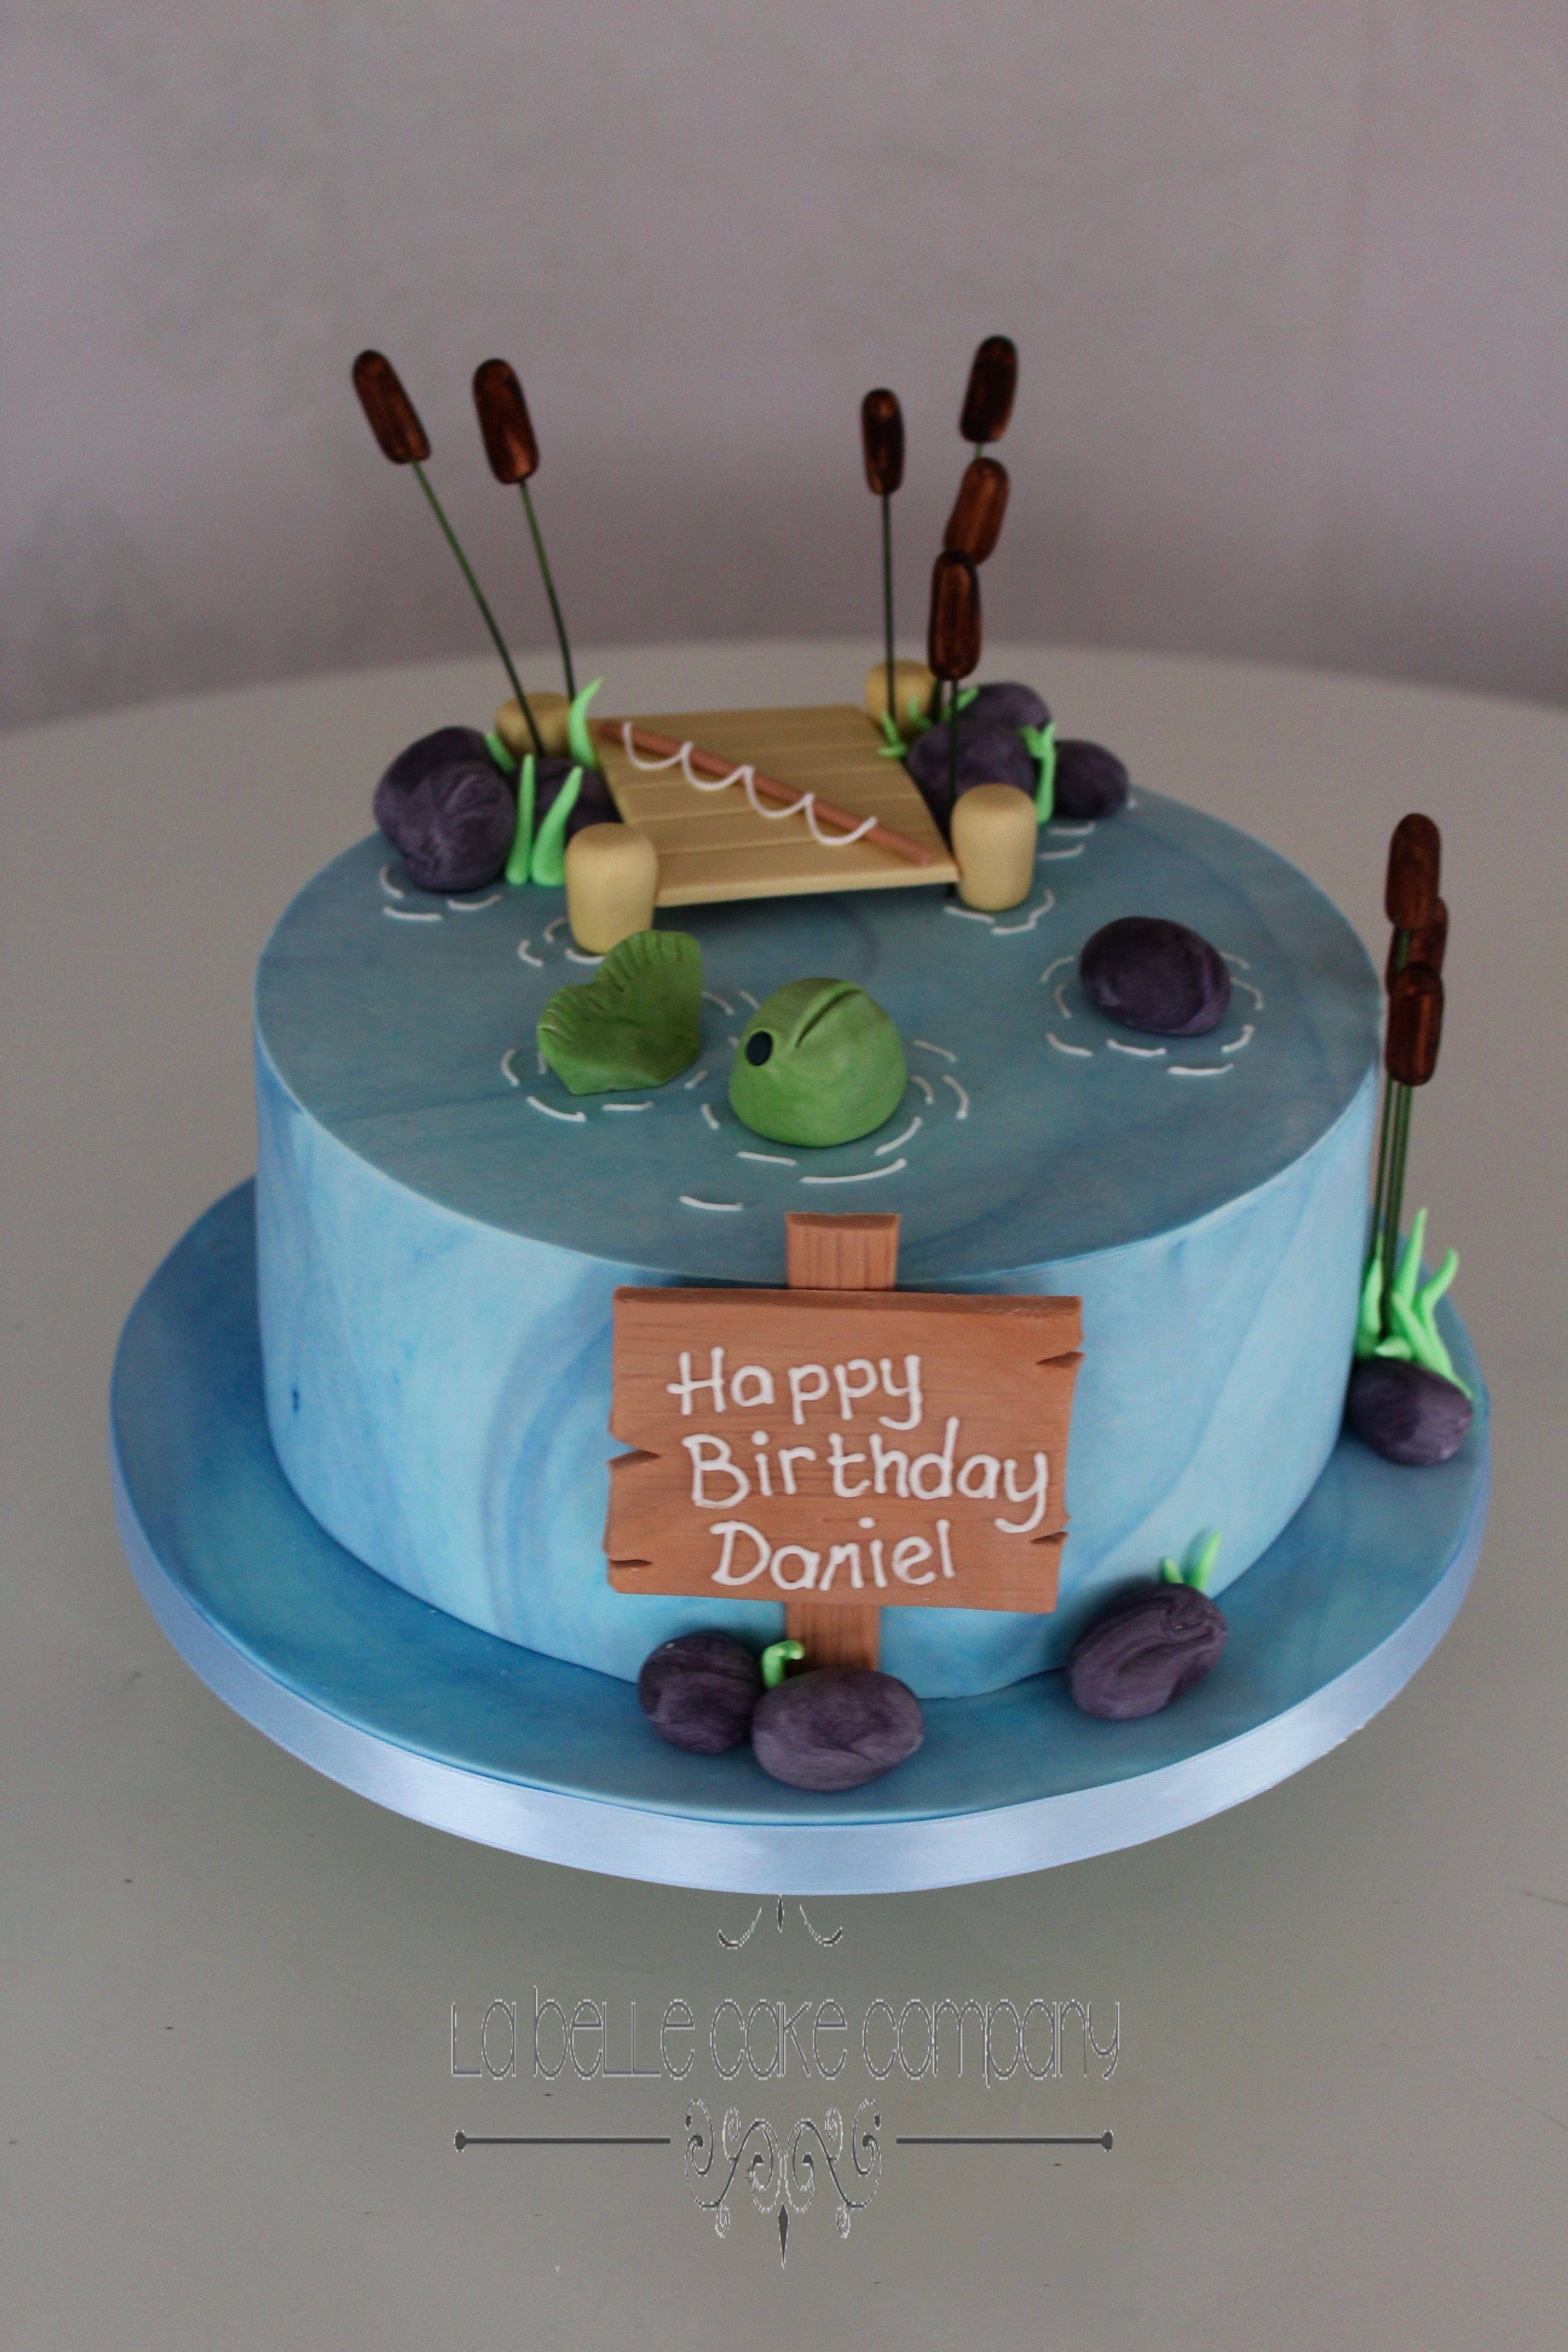 Fishing Angling Birthday Celebration Cake By La Belle Cake Company